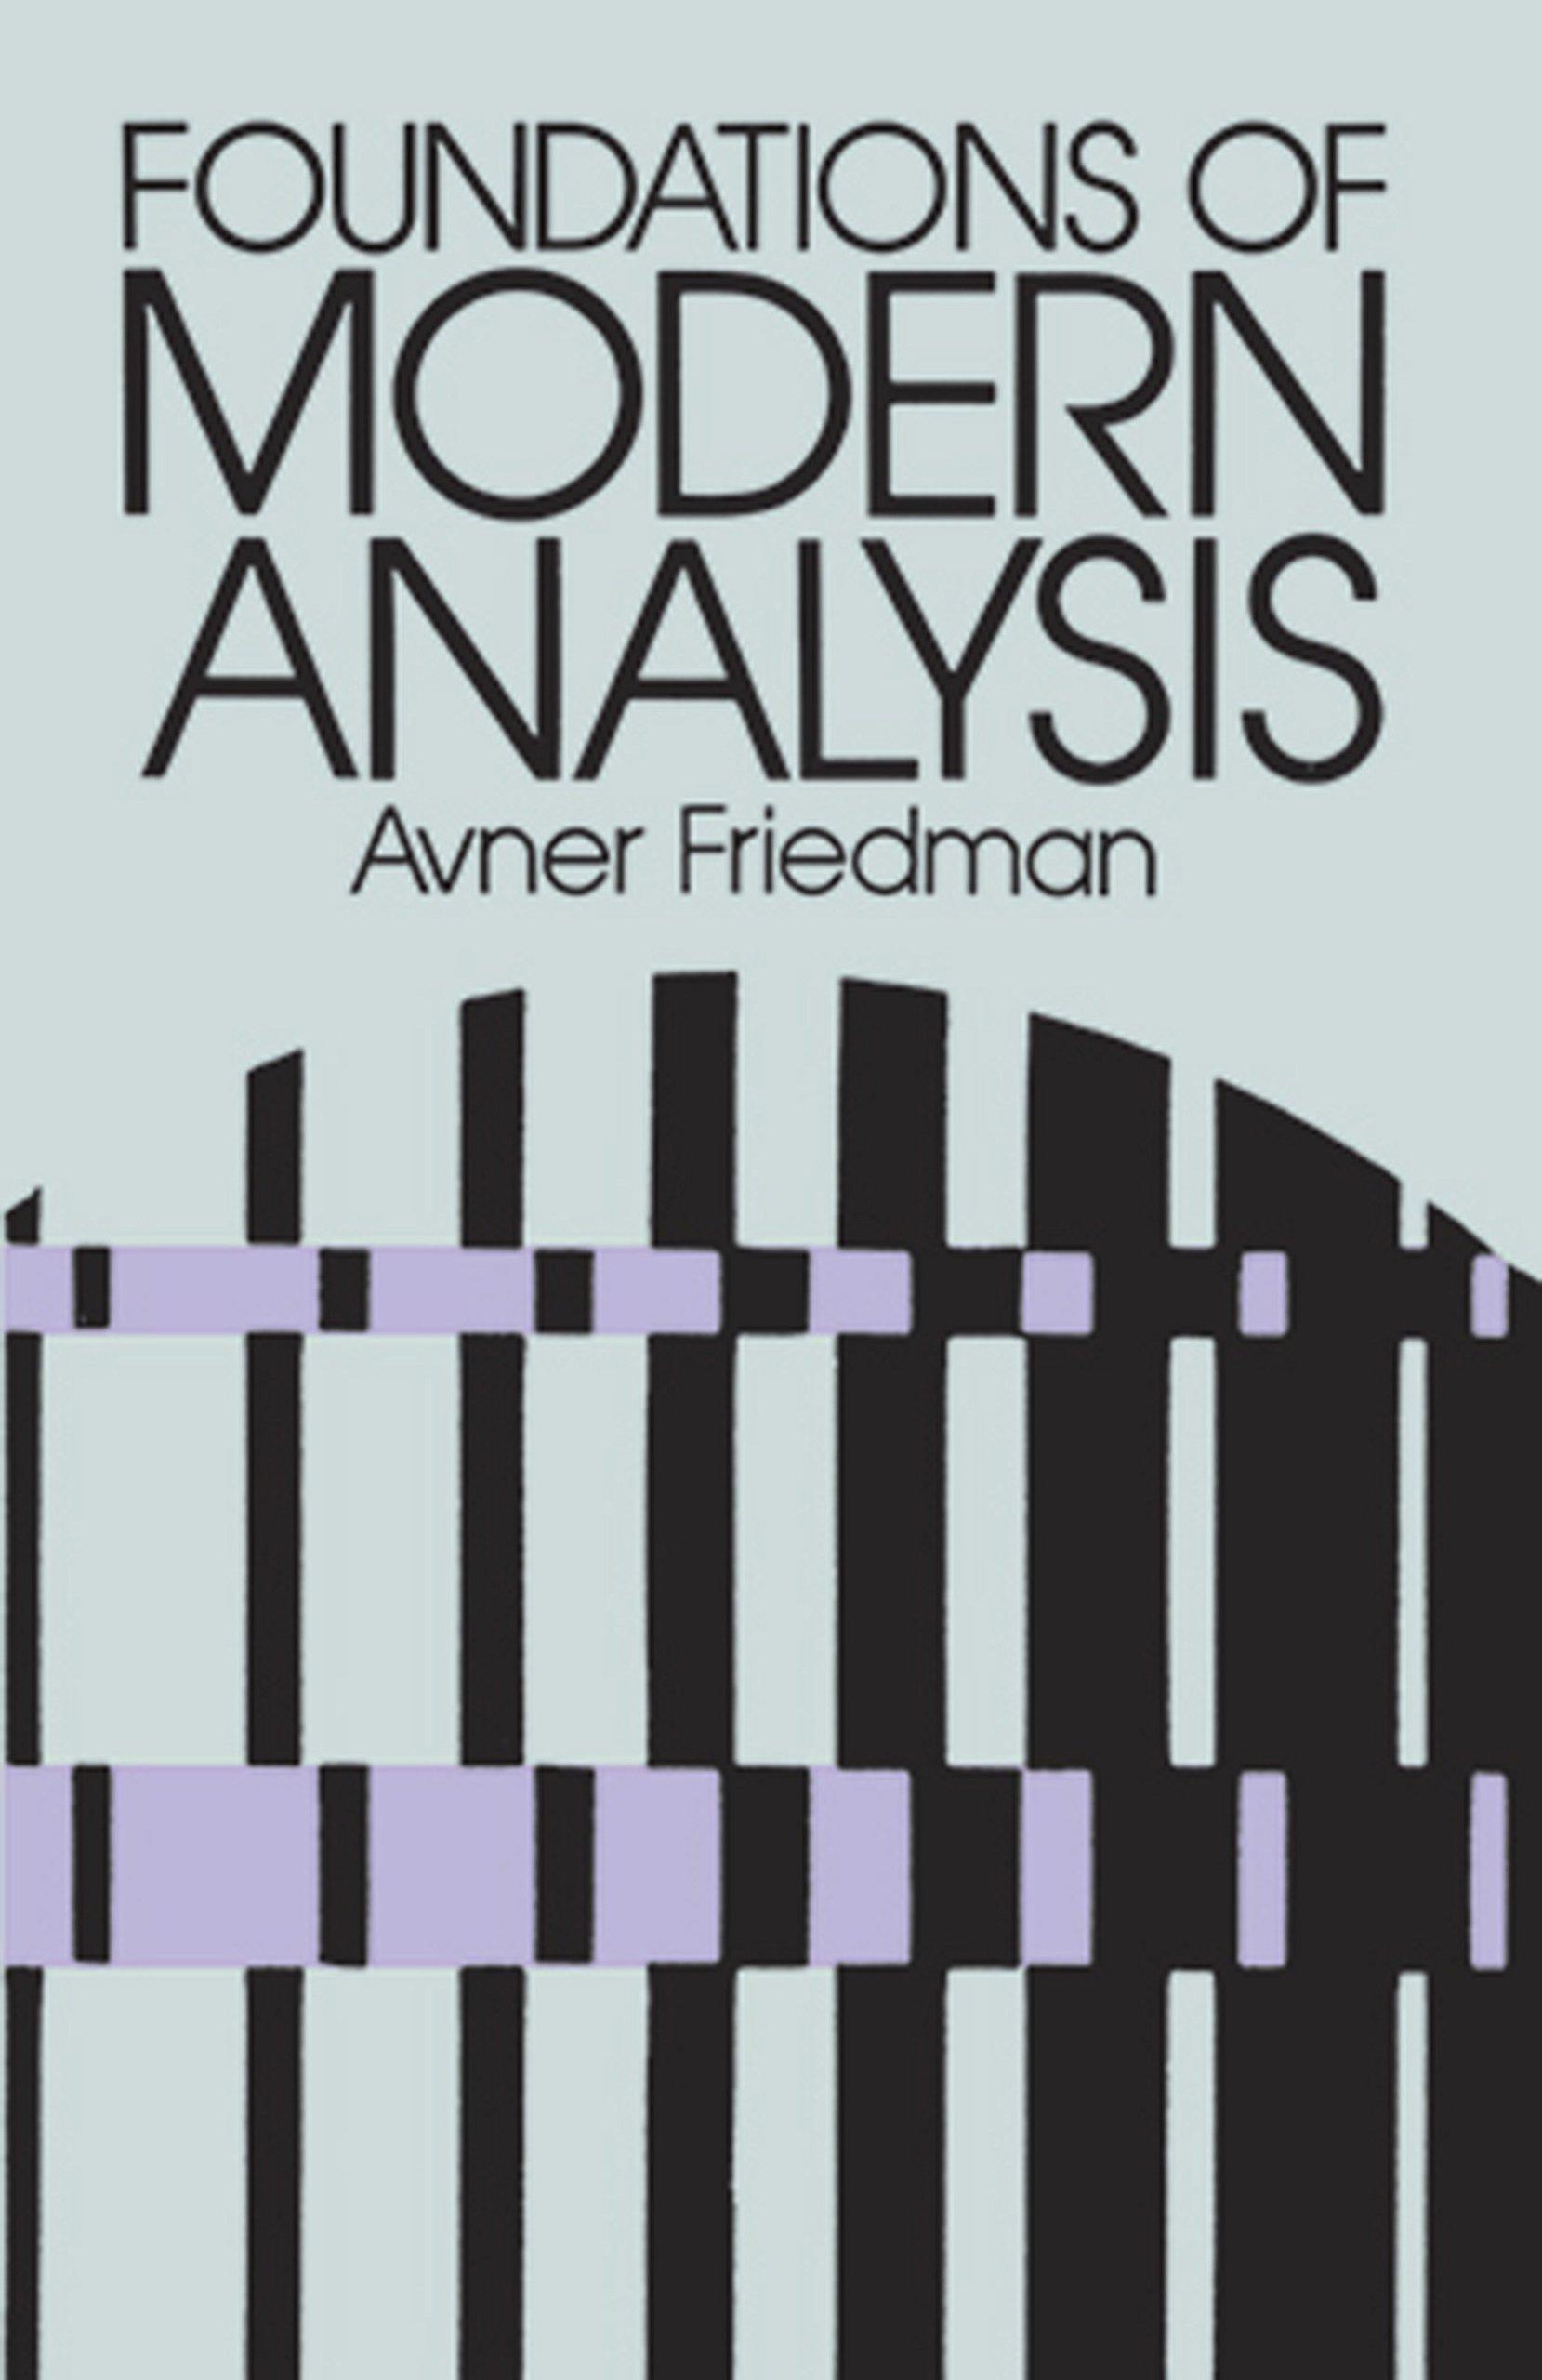 Foundations of Modern Analysis (Dover Books on Mathematics)